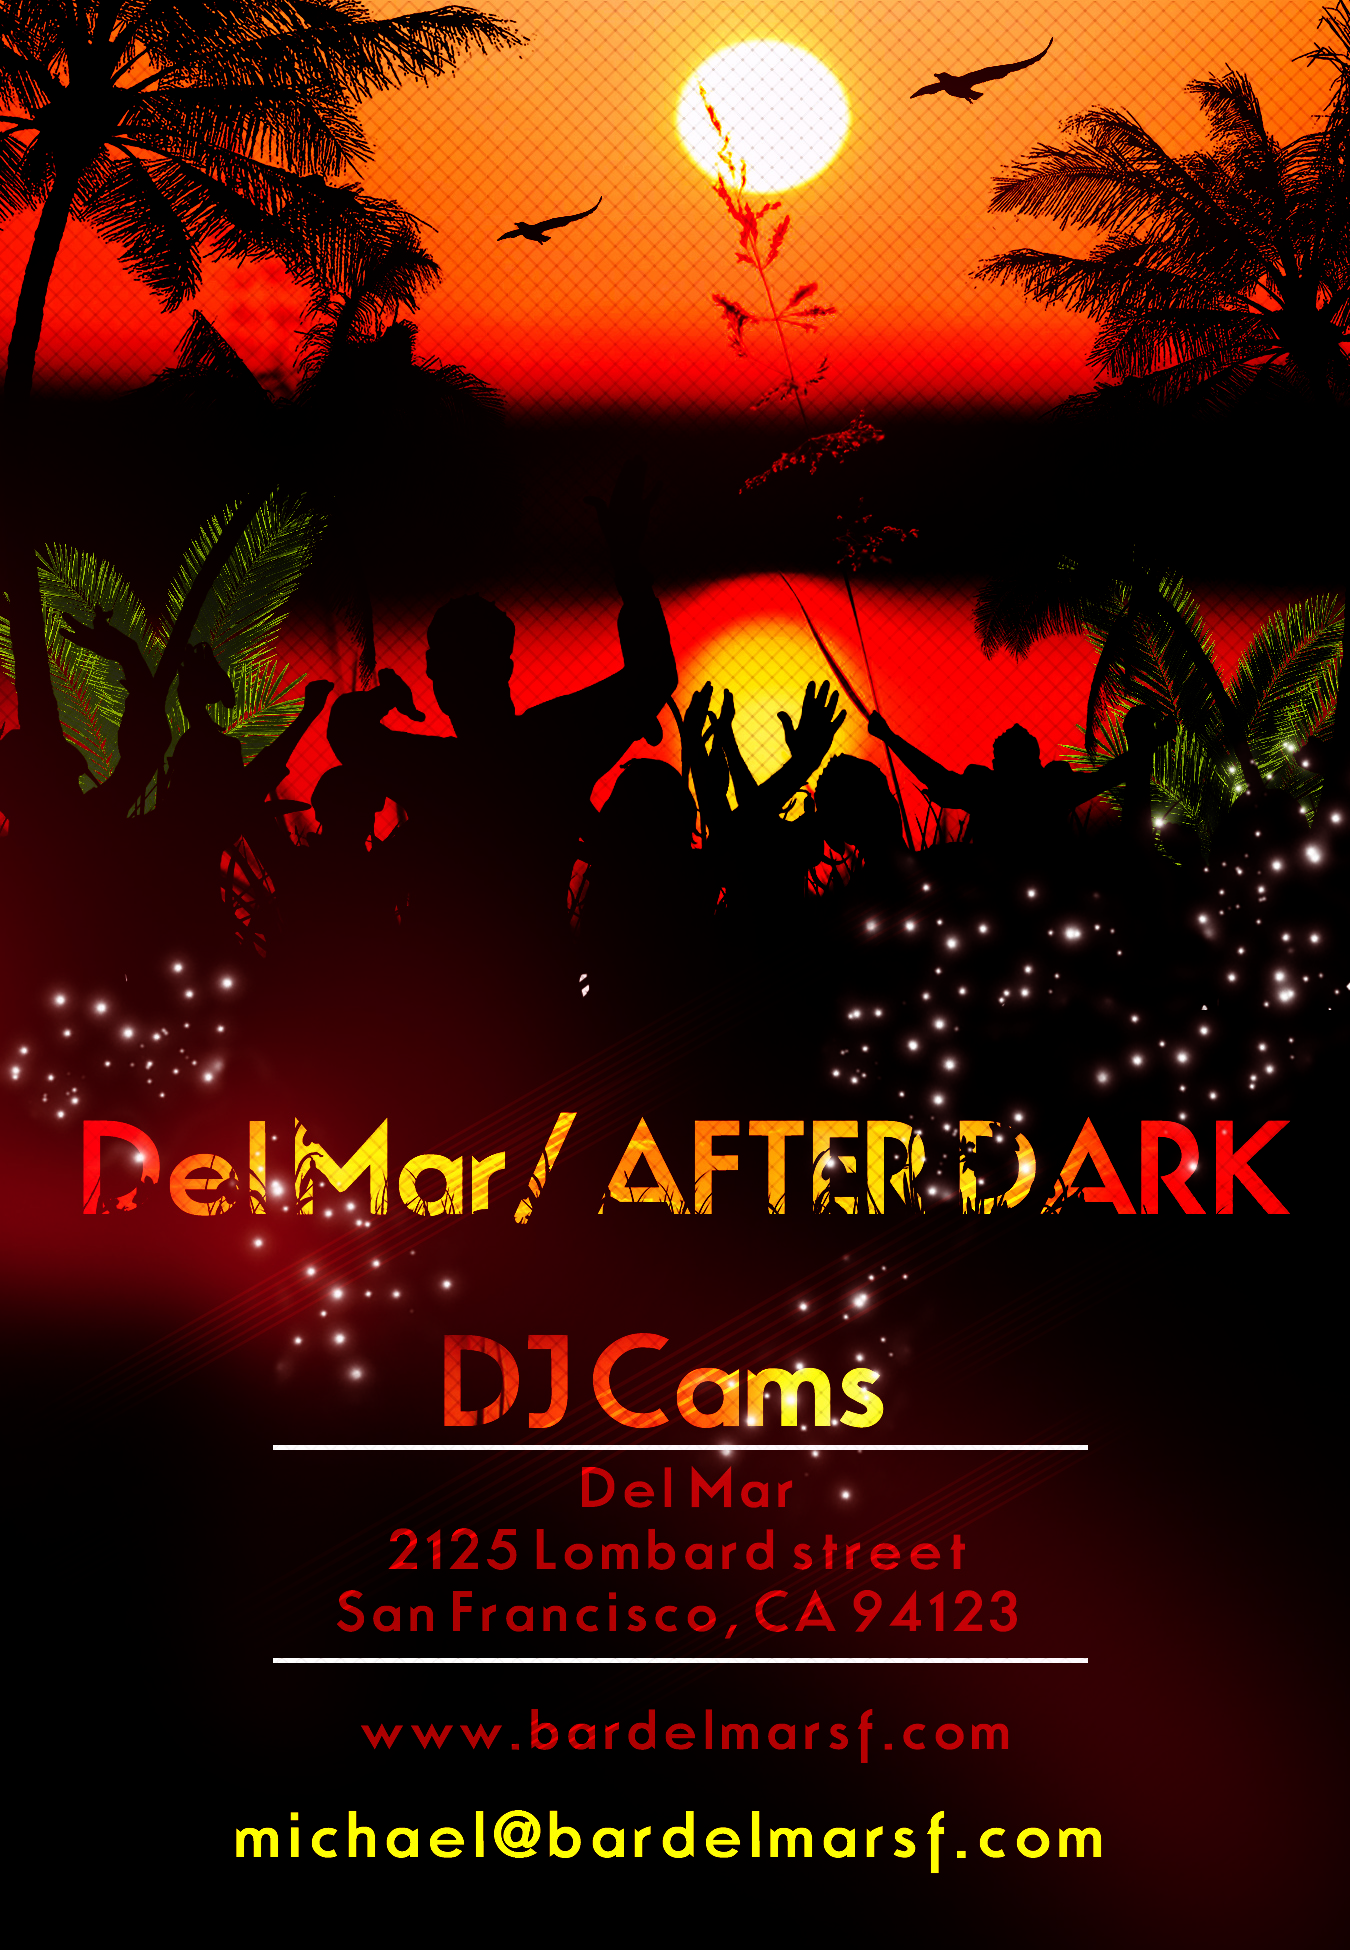 Del Mar After Dark flyer DJ Cams.jpg